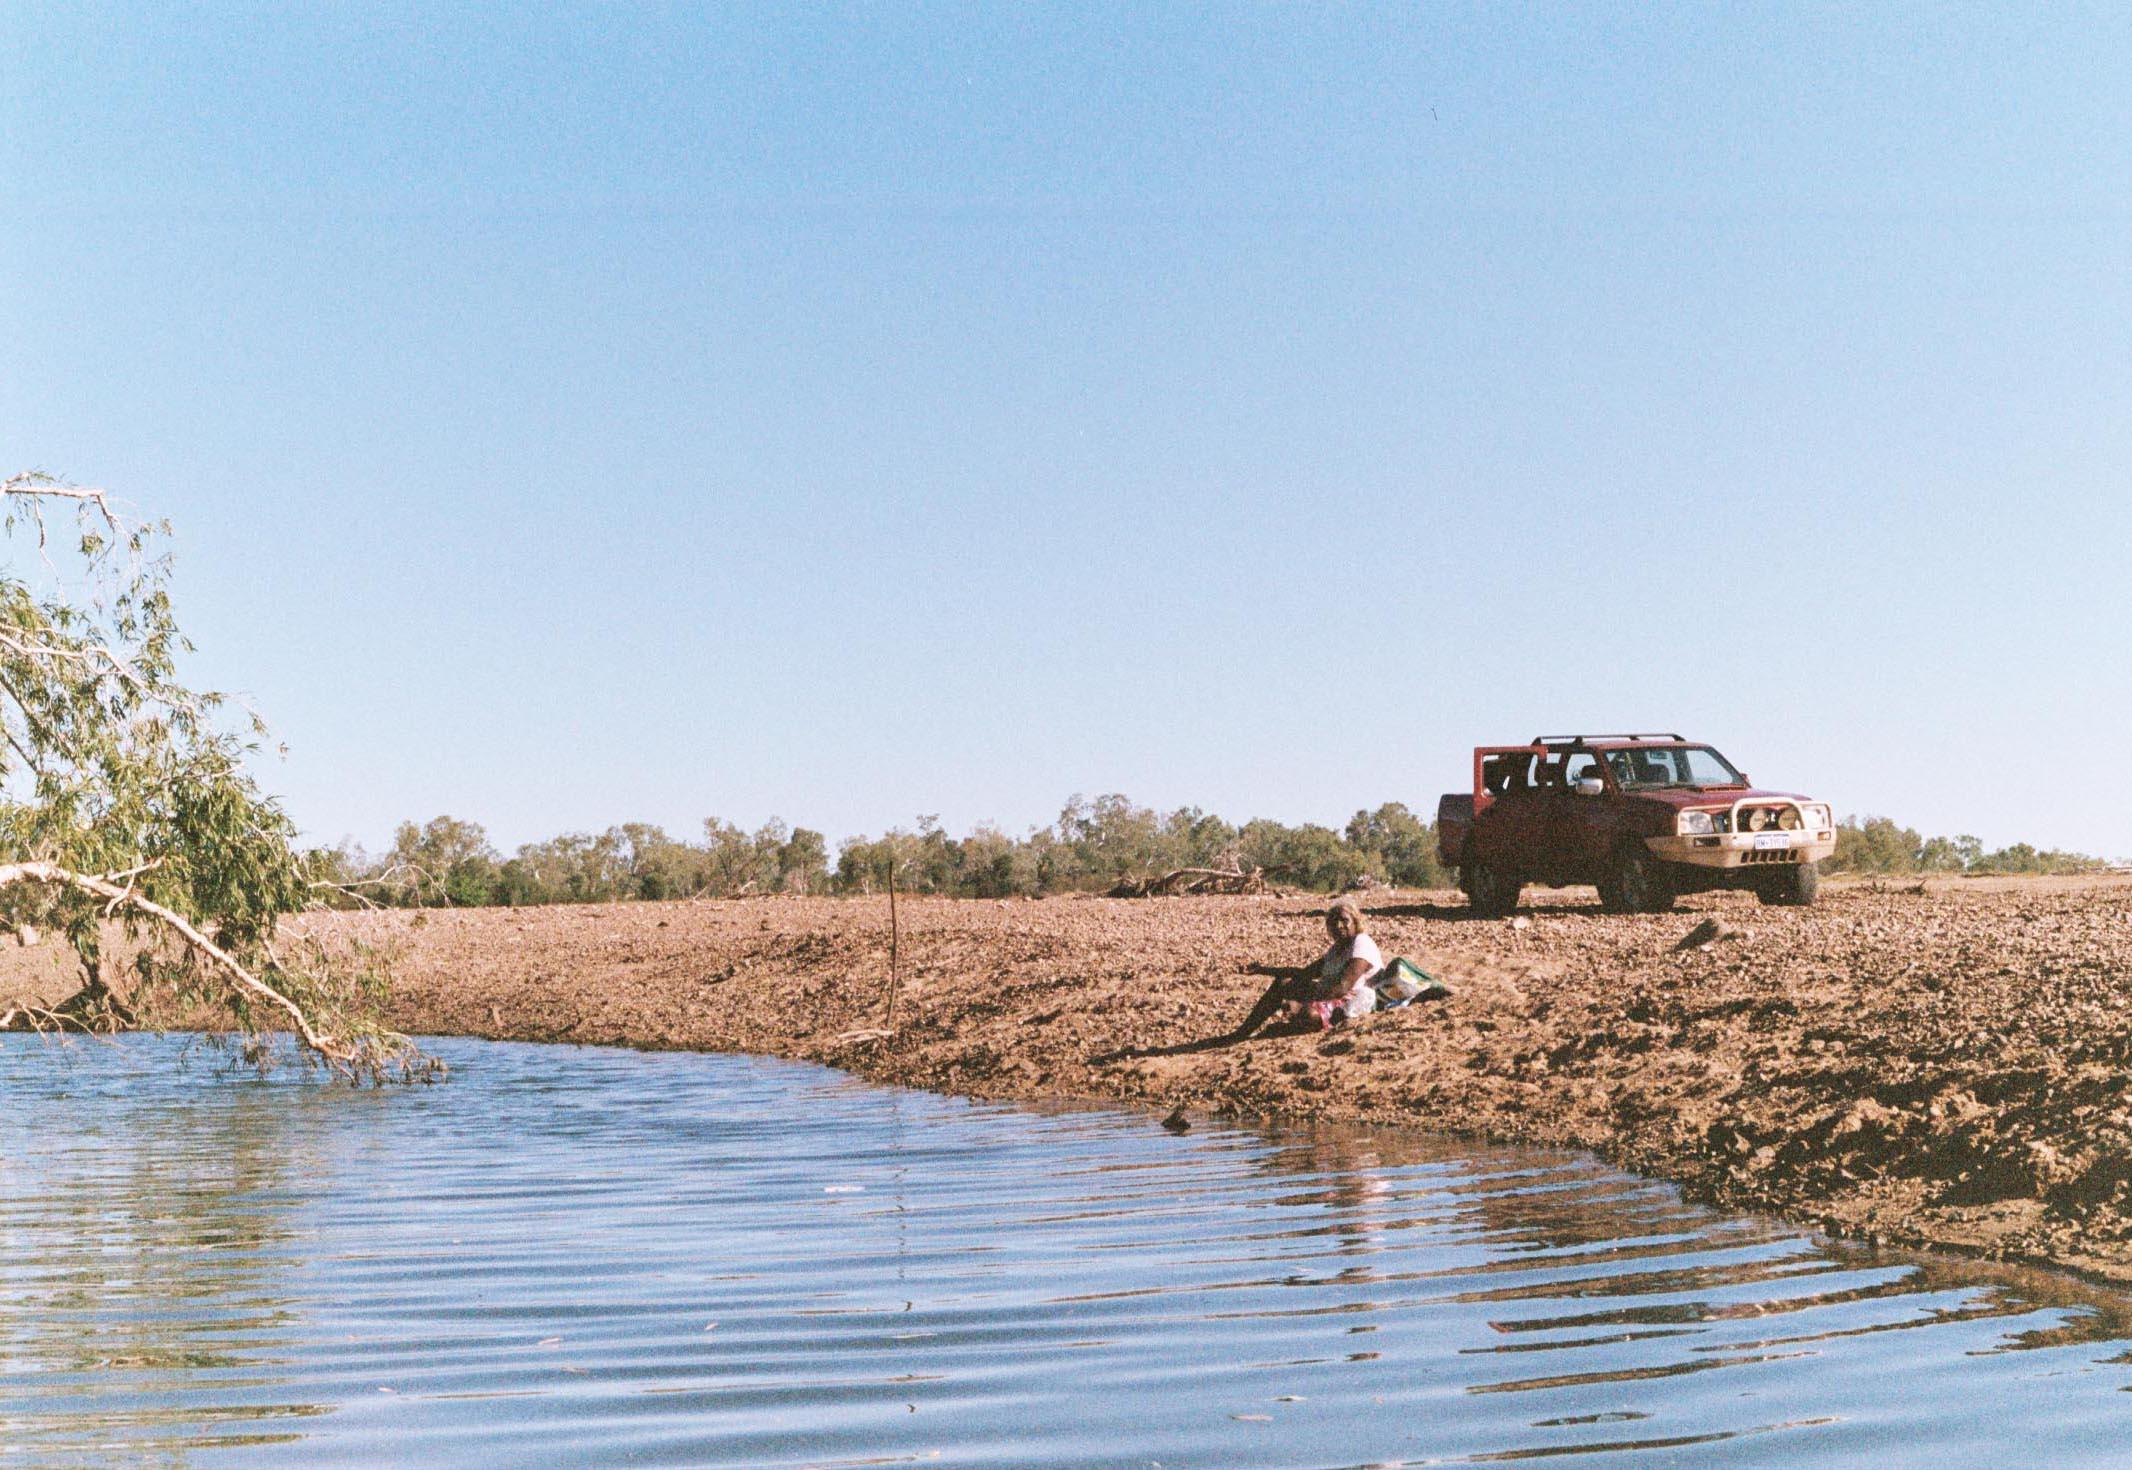 Nita Fishing, Fitzroy River, WA